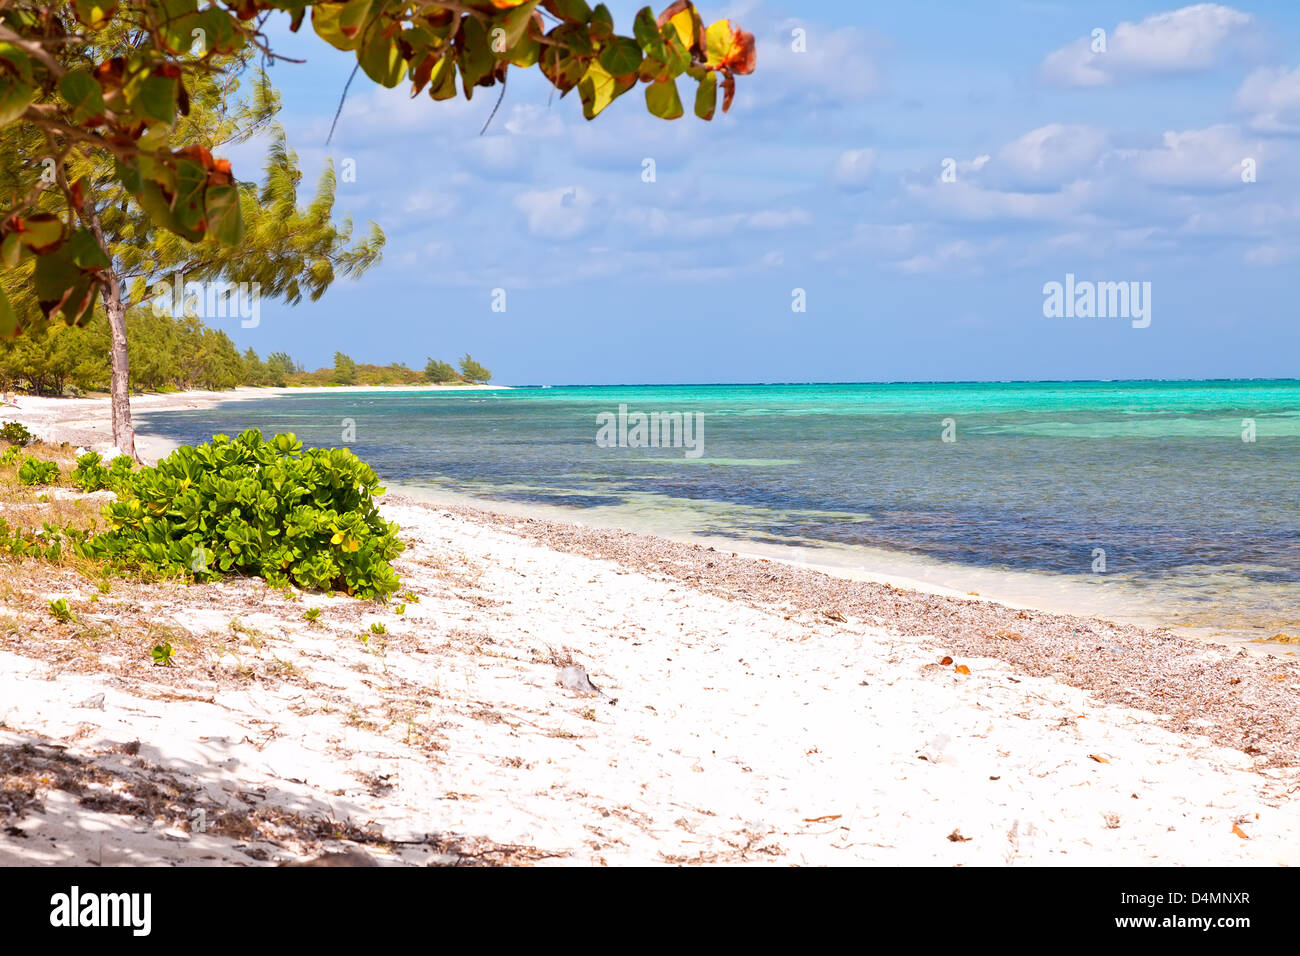 Seven Mile Beach on Grand Cayman, Cayman Islands - Stock Image